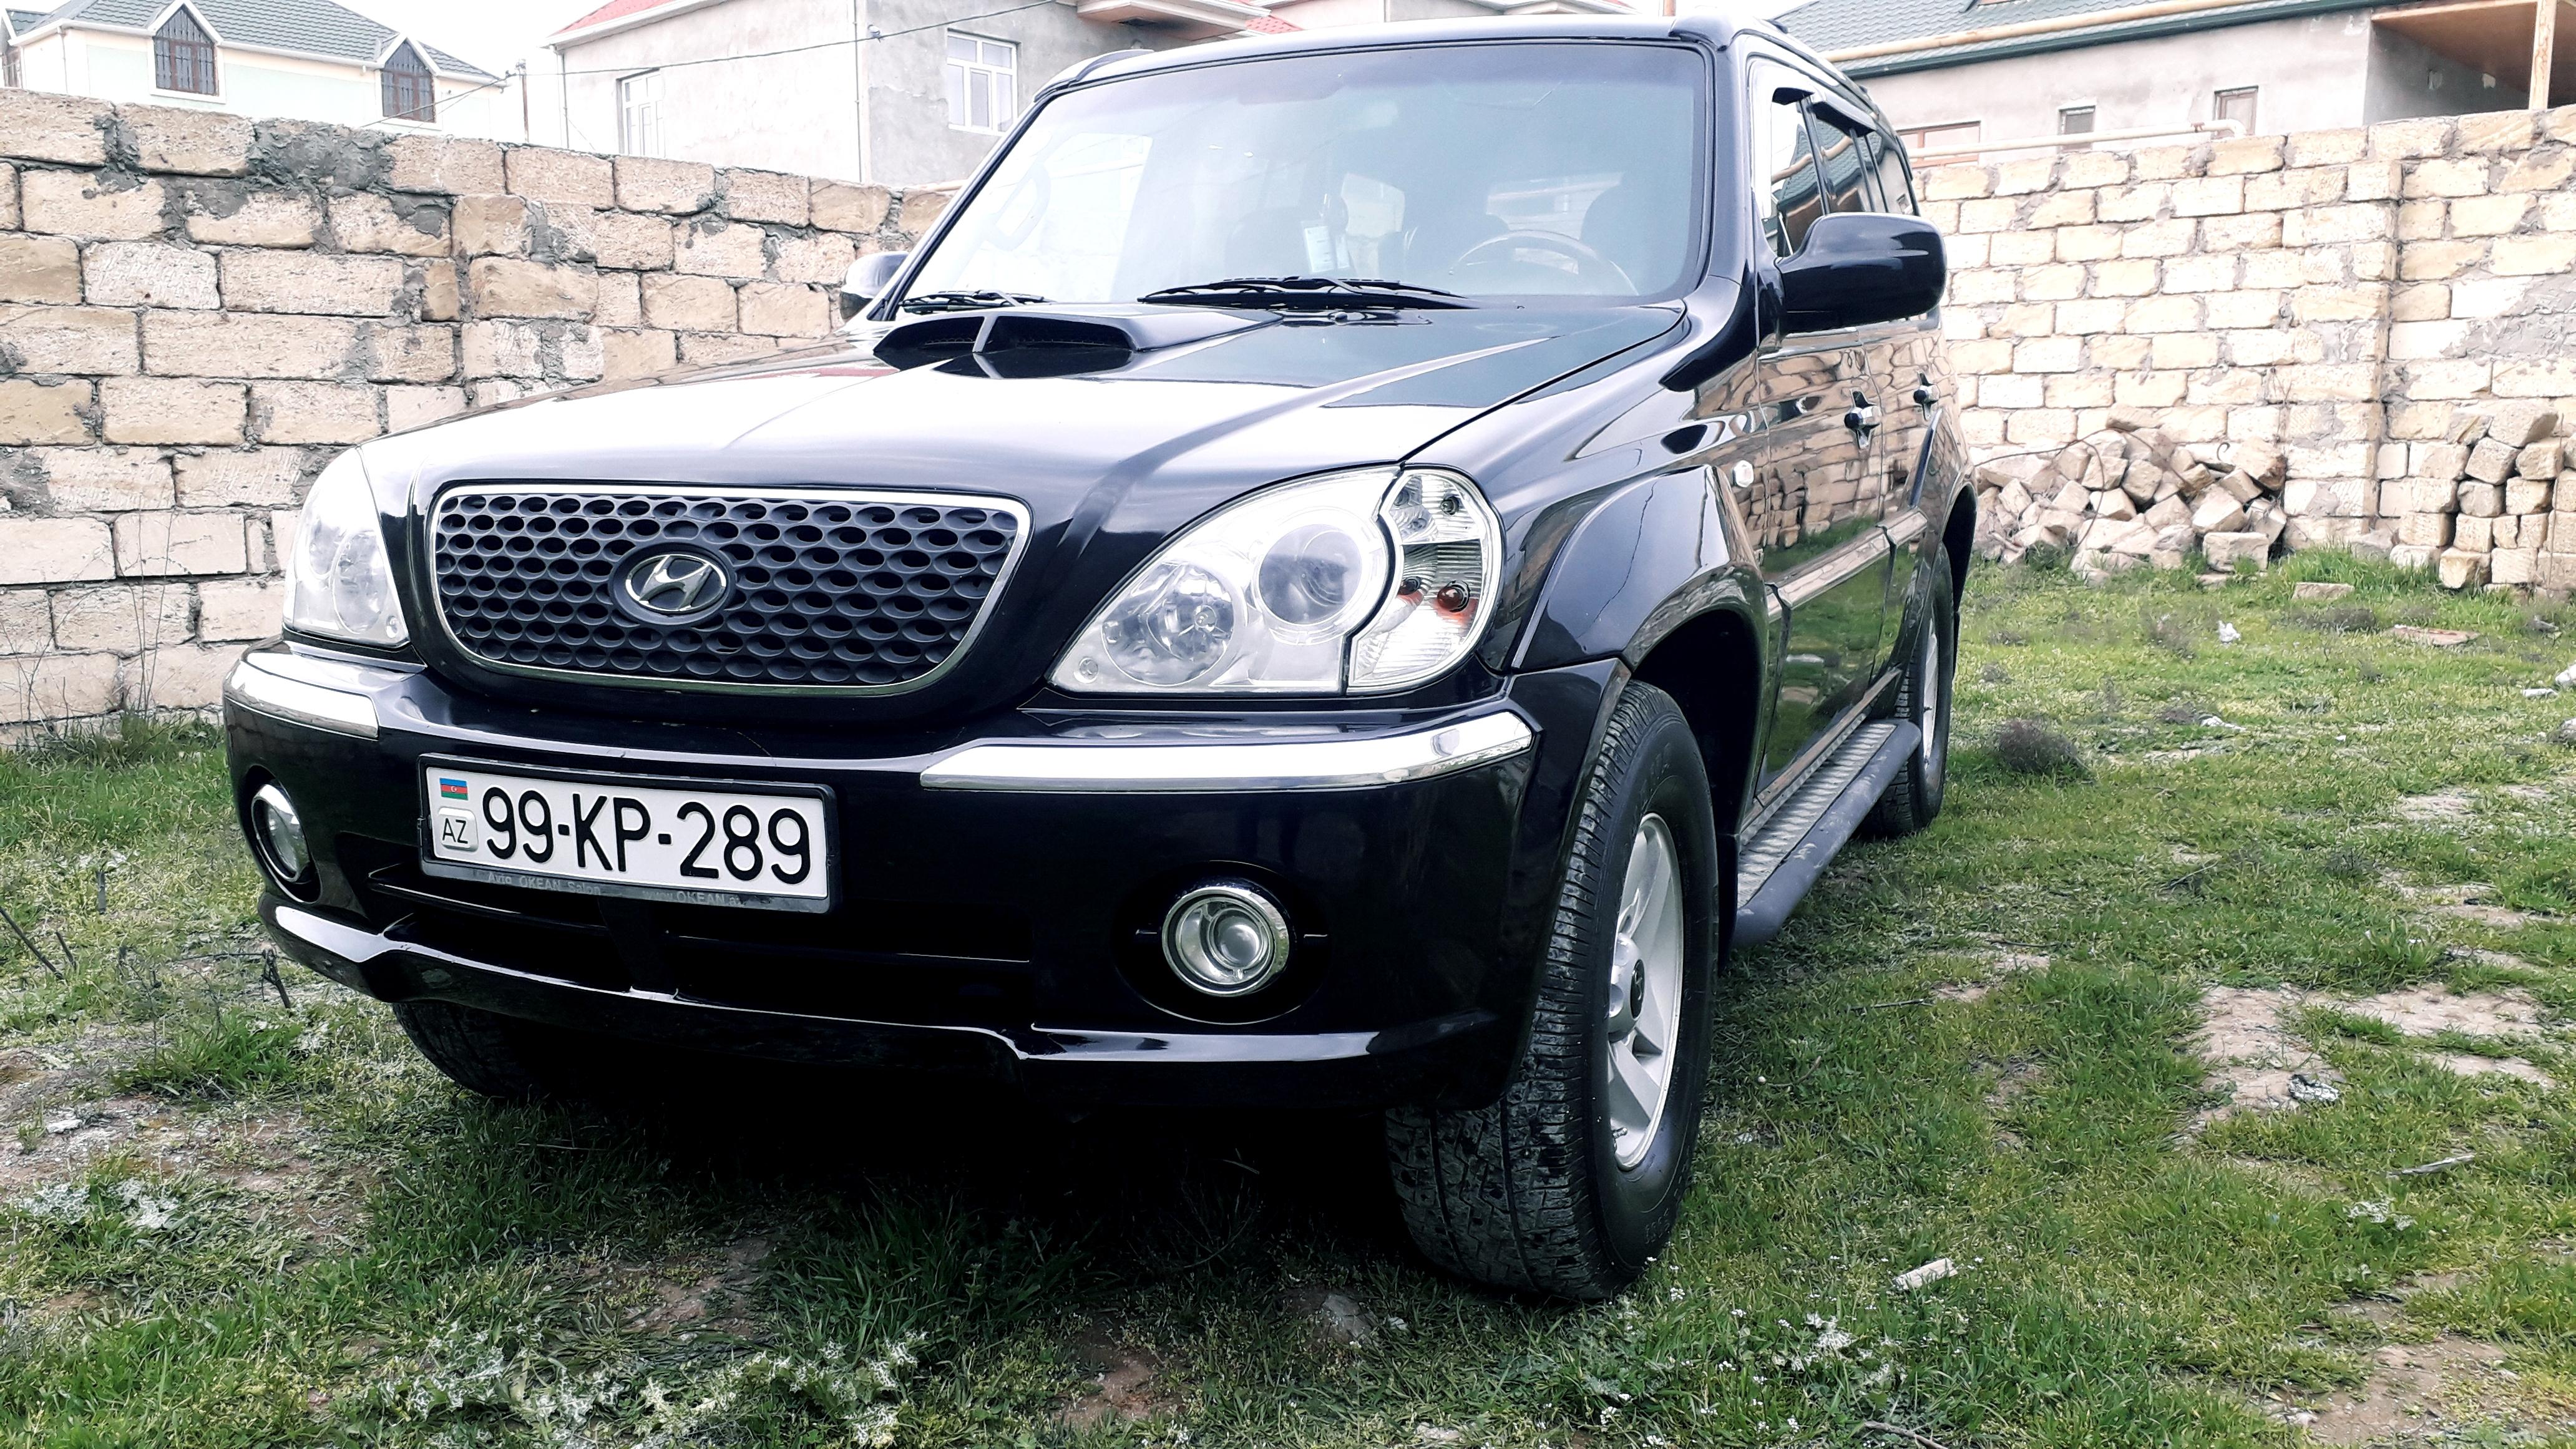 Hyundai Terracan 2.9(lt) 2001 İkinci əl  $12000